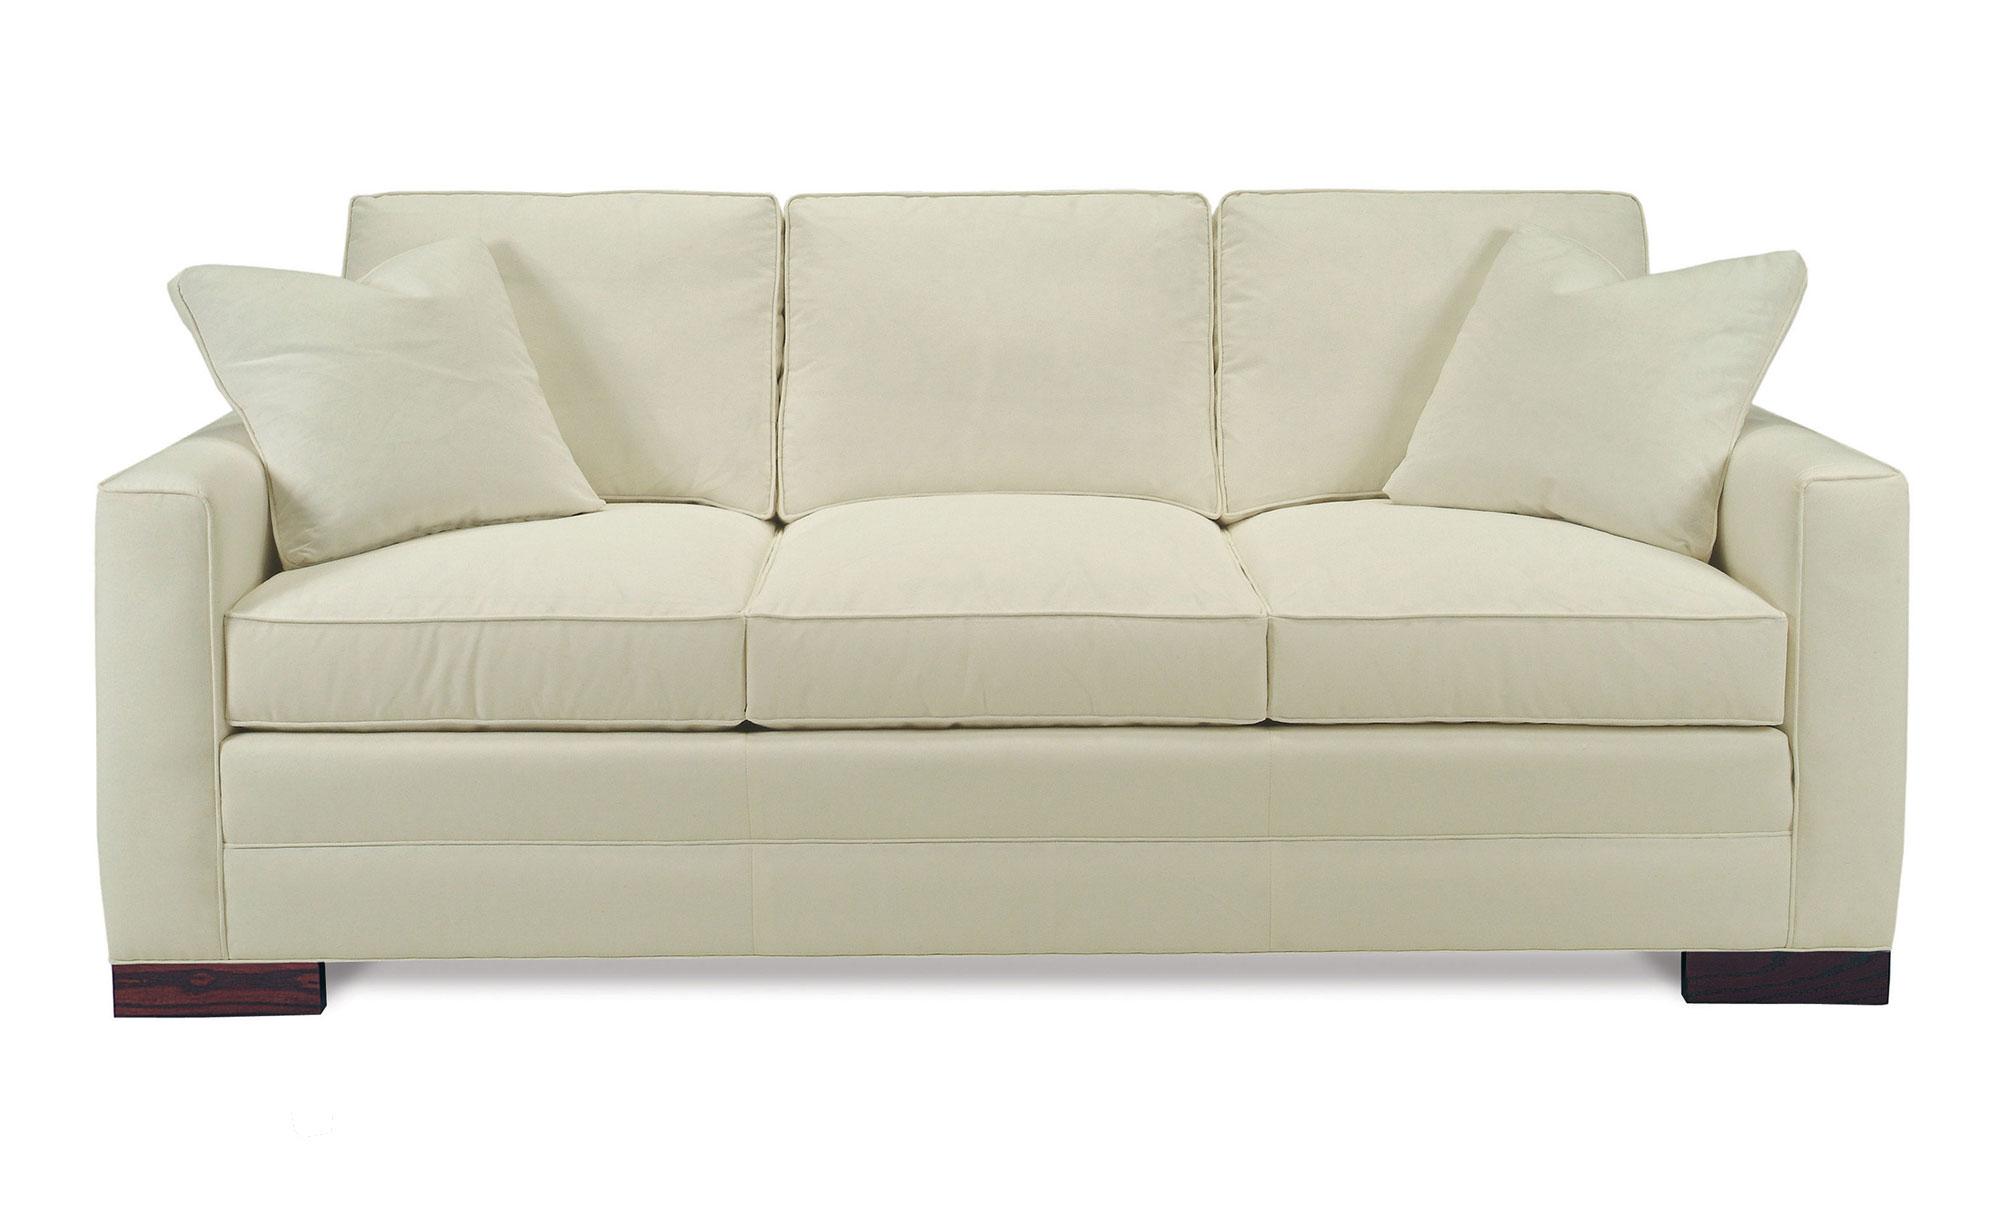 Vanguard Sofa 229604